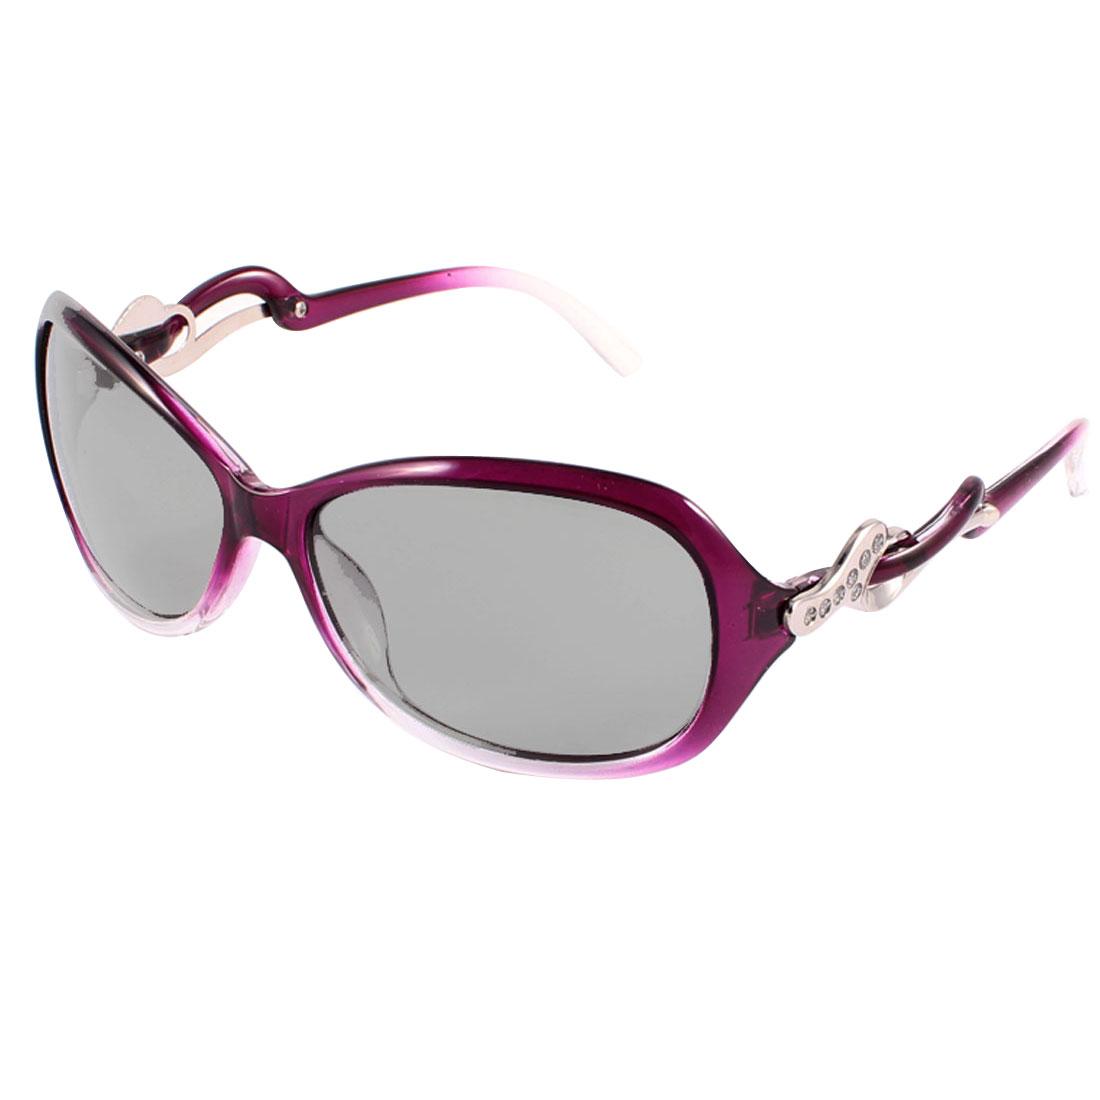 Lady Plastic Glitter Powder Detail Arm Teardrop Lens Polarized Sunglasses Purple